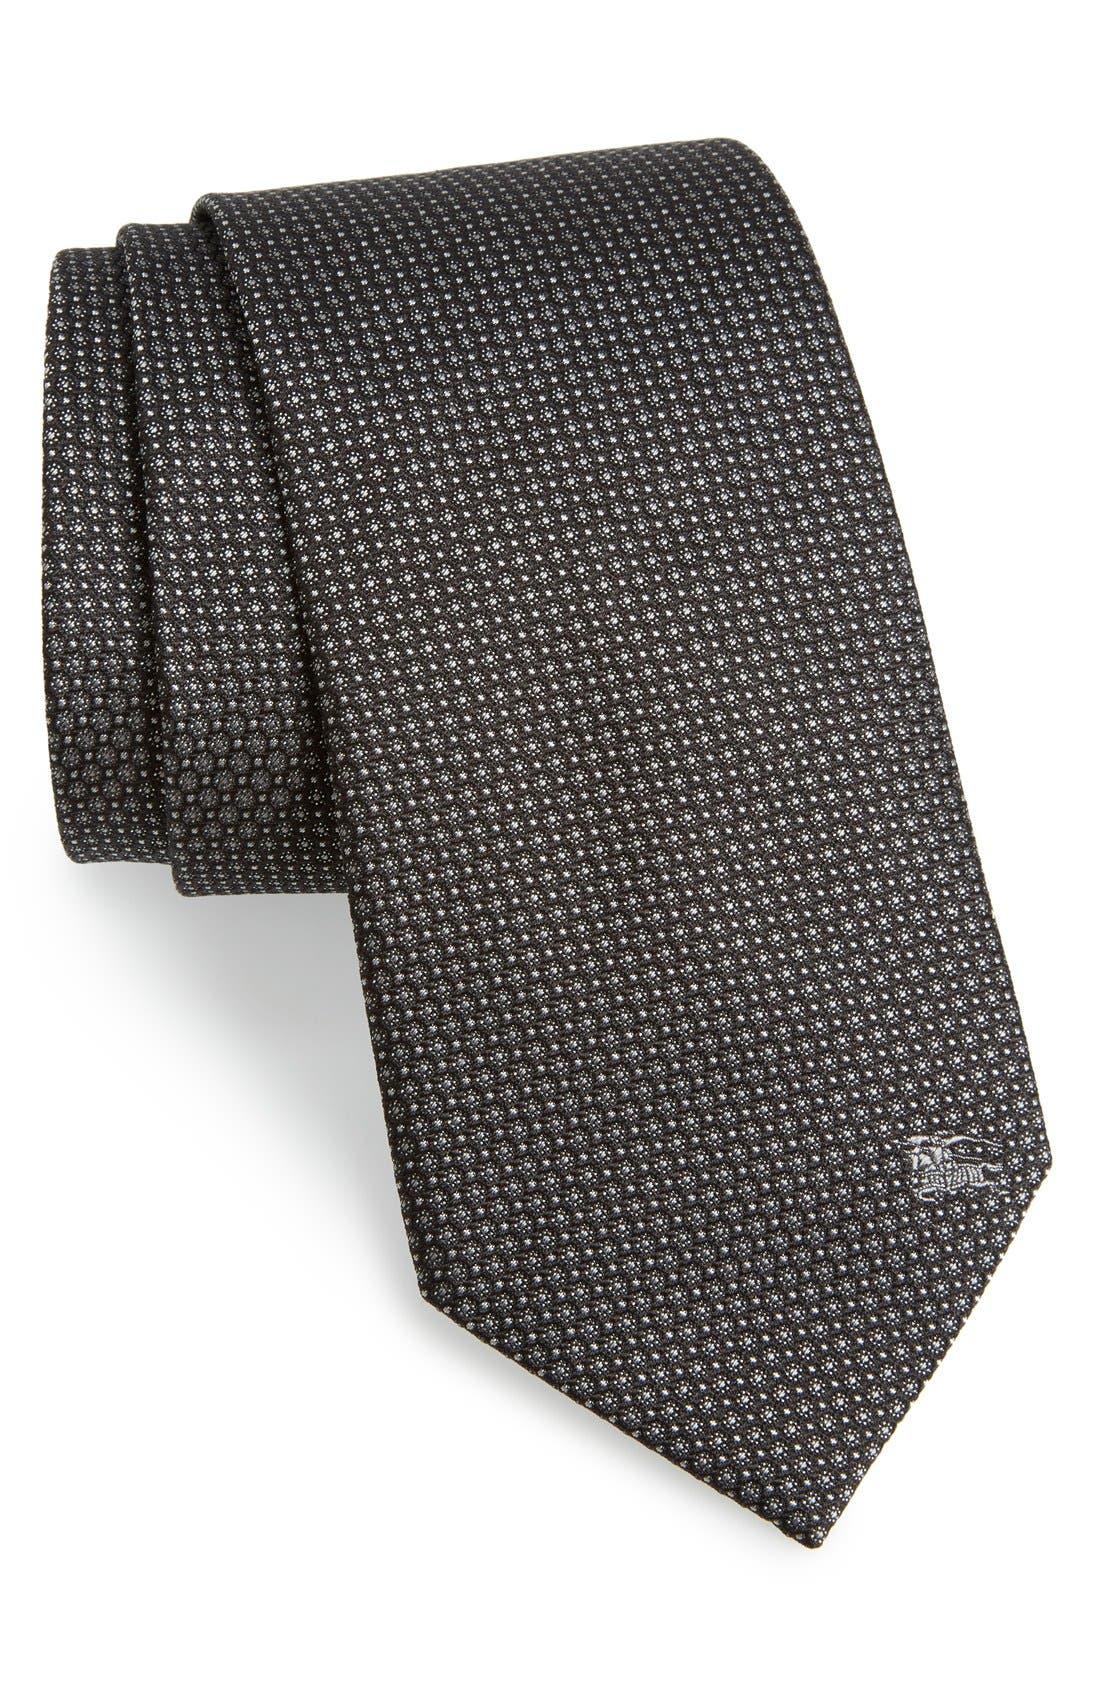 Burberry London 'Clinton' Medallion Silk Tie